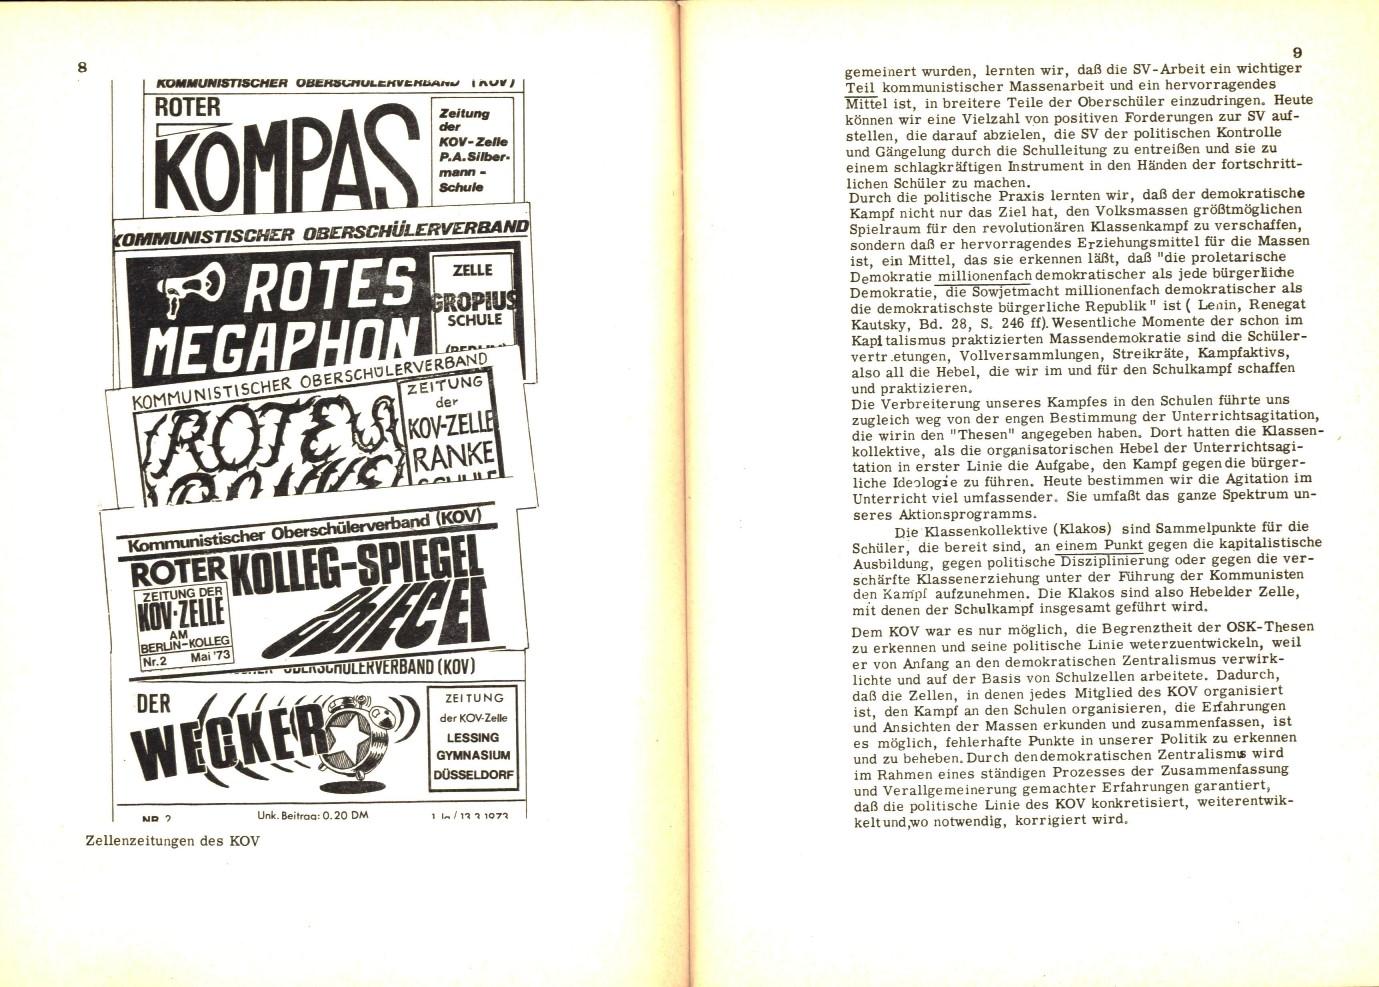 KOV_1973_Aktionsprogramm_07